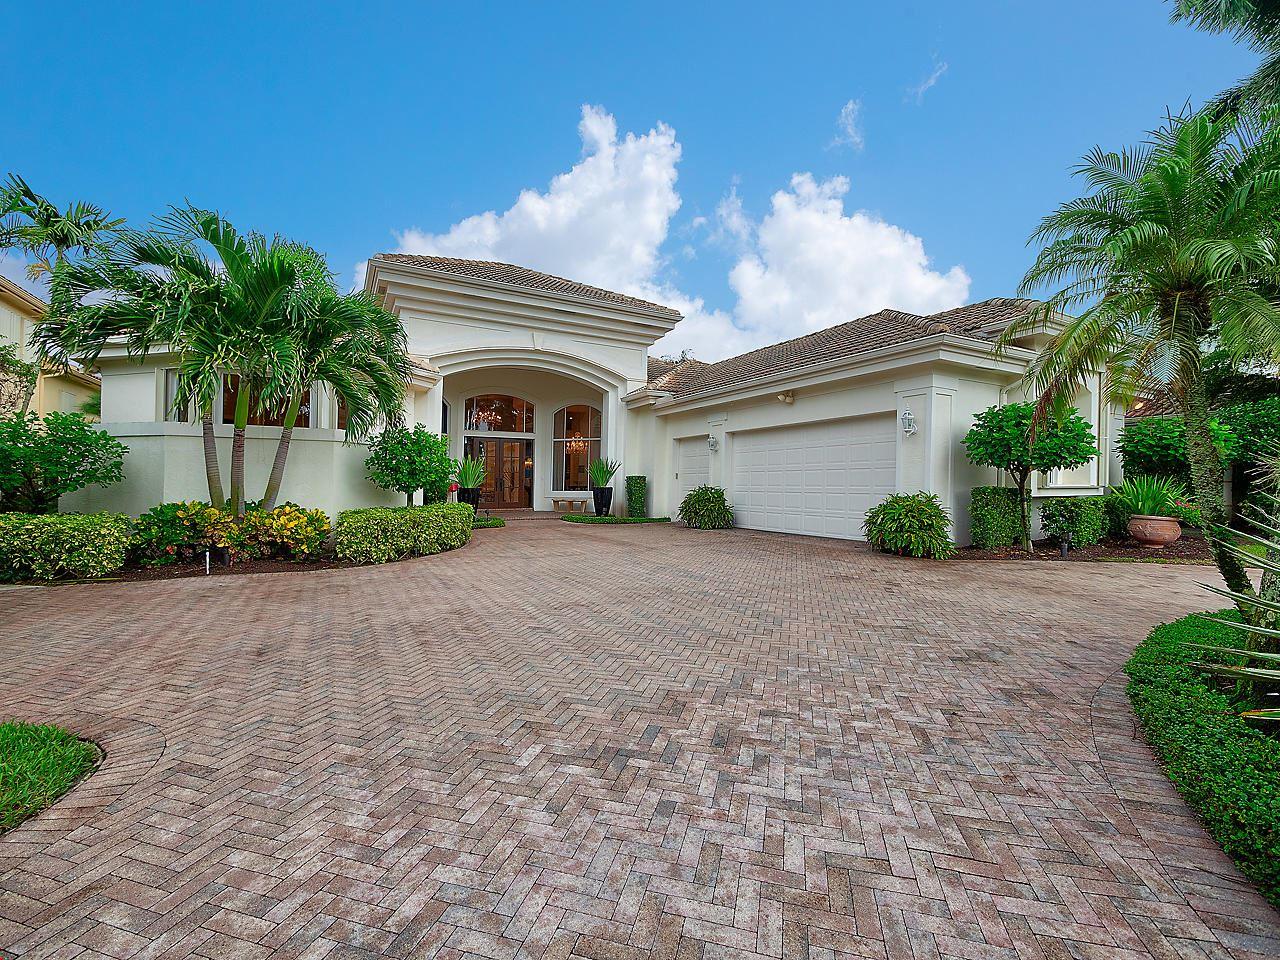 Photo of 120 Saint Martin Drive, Palm Beach Gardens, FL 33418 (MLS # RX-10665722)